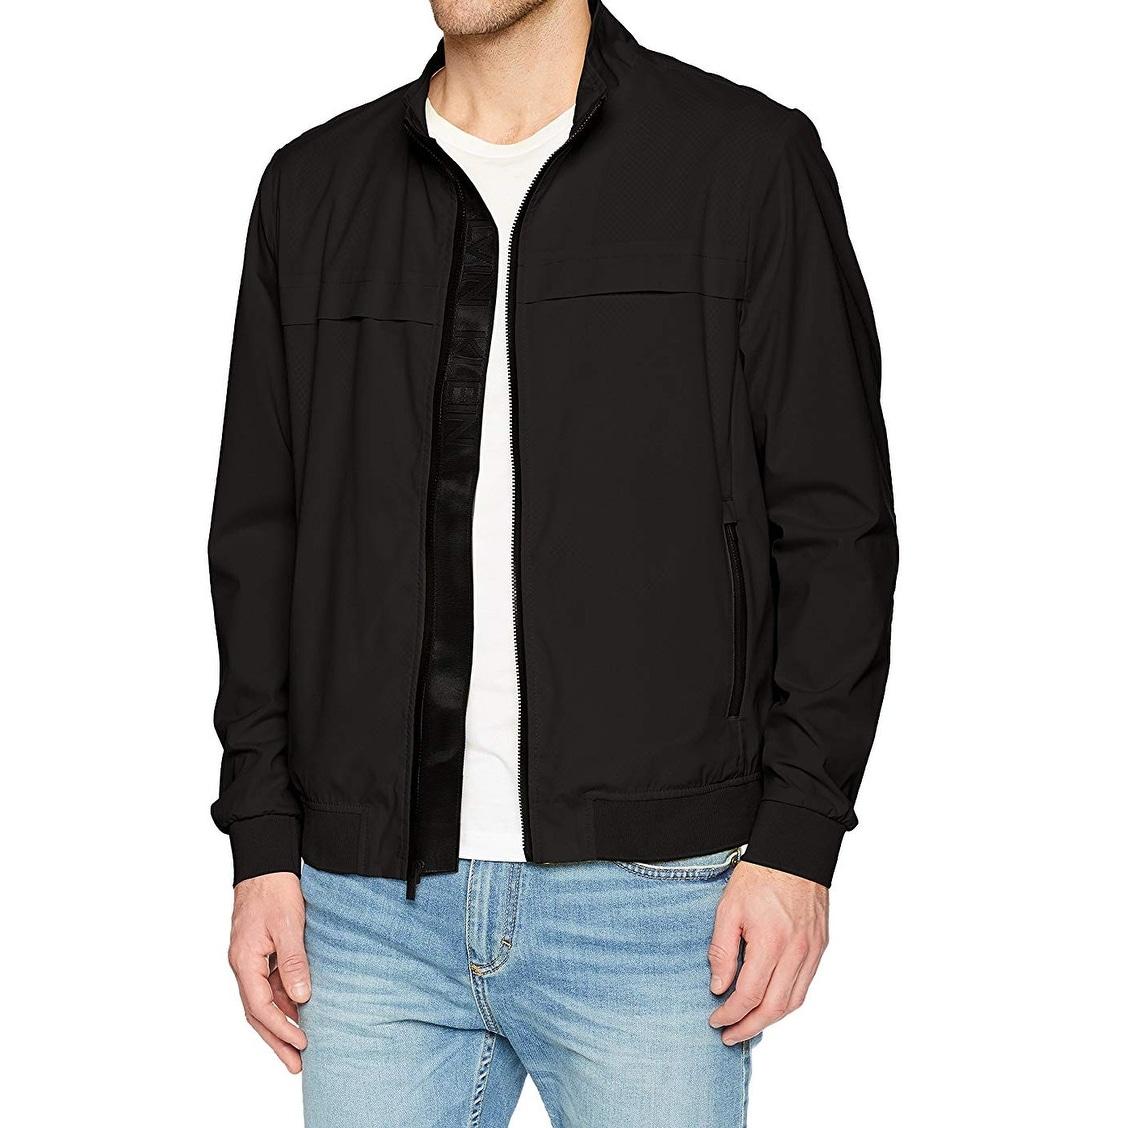 89d39c706 Men's Calvin Klein Outerwear | Find Great Men's Clothing Deals ...